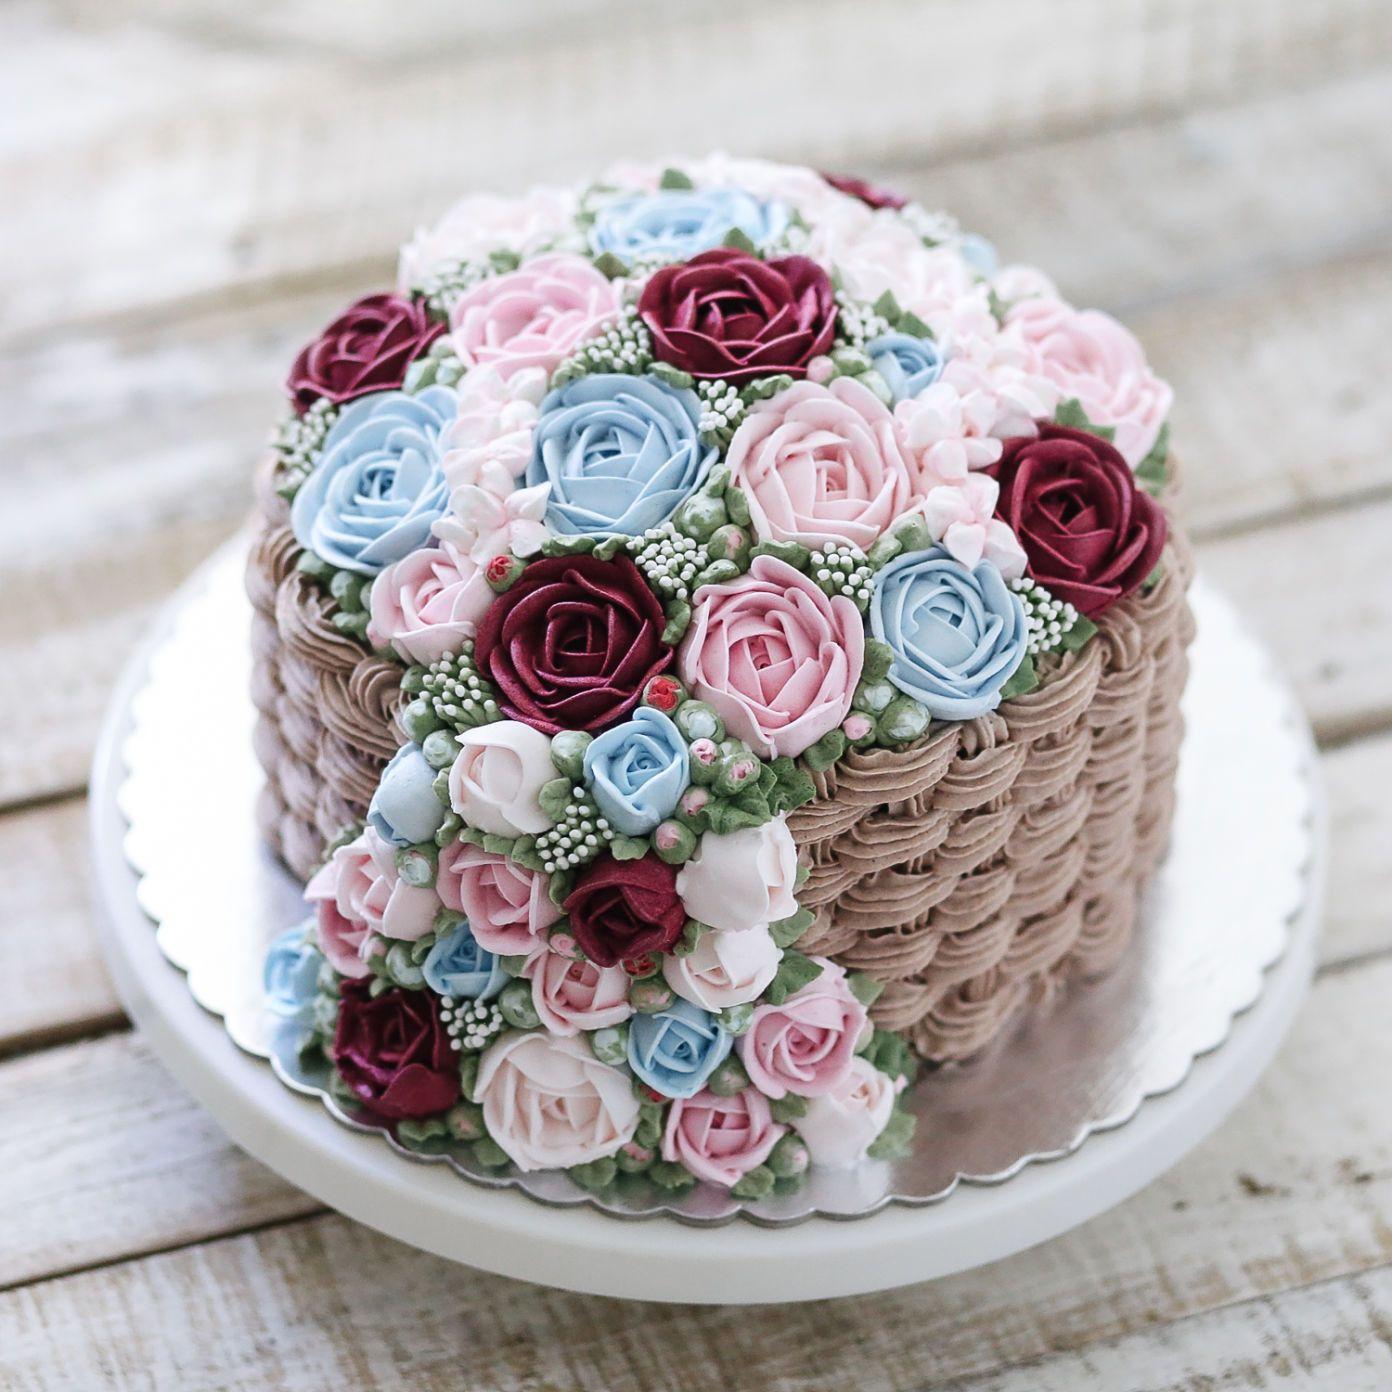 Anniversary or birthday cake by ivenoven 011 food art idea anniversary or birthday cake by ivenoven 011 izmirmasajfo